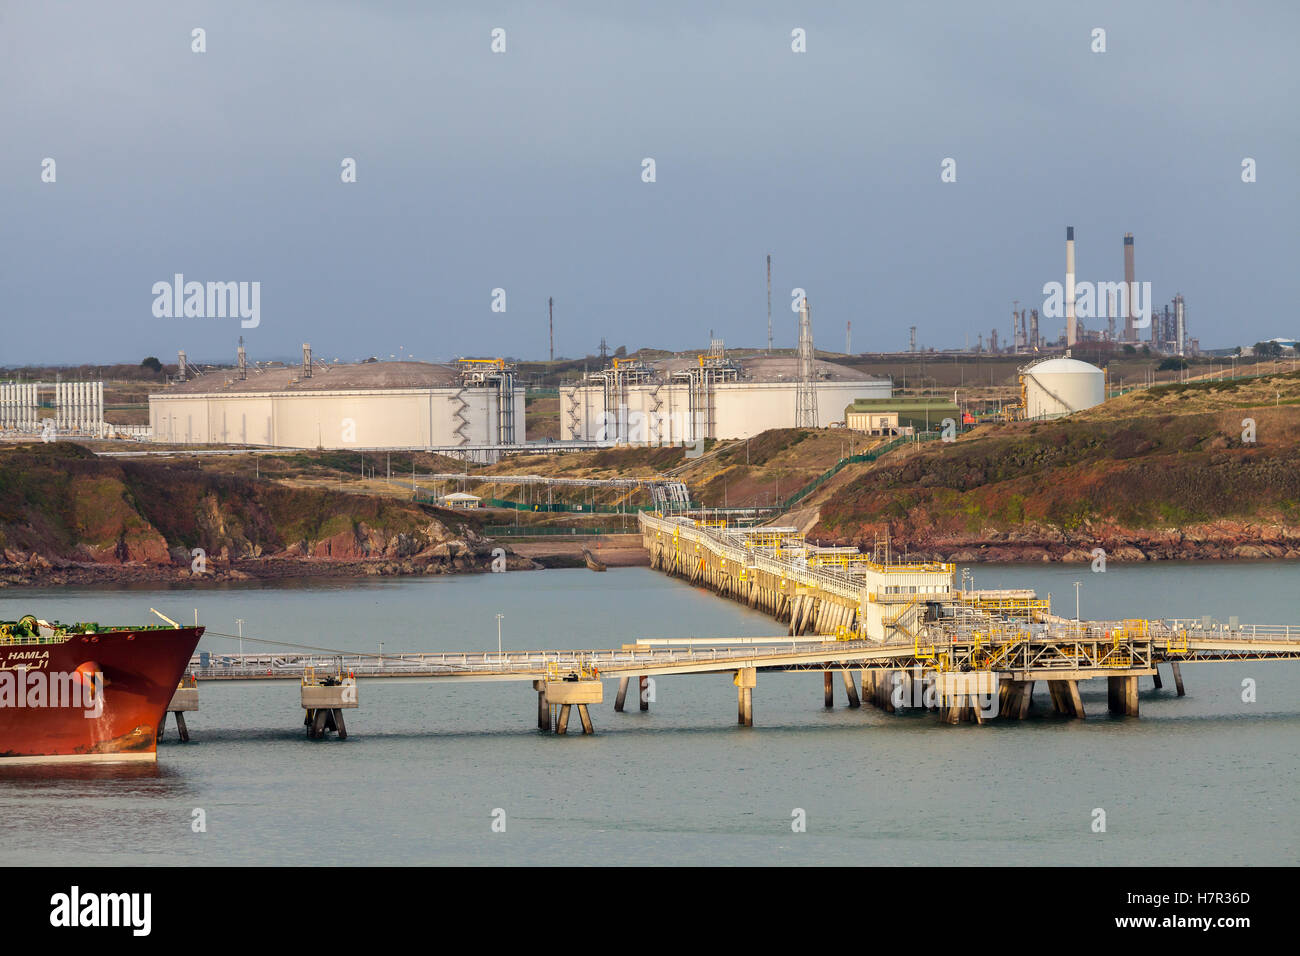 Milford Haven, Pembrokeshire, Öl und LNG-terminals Stockfoto